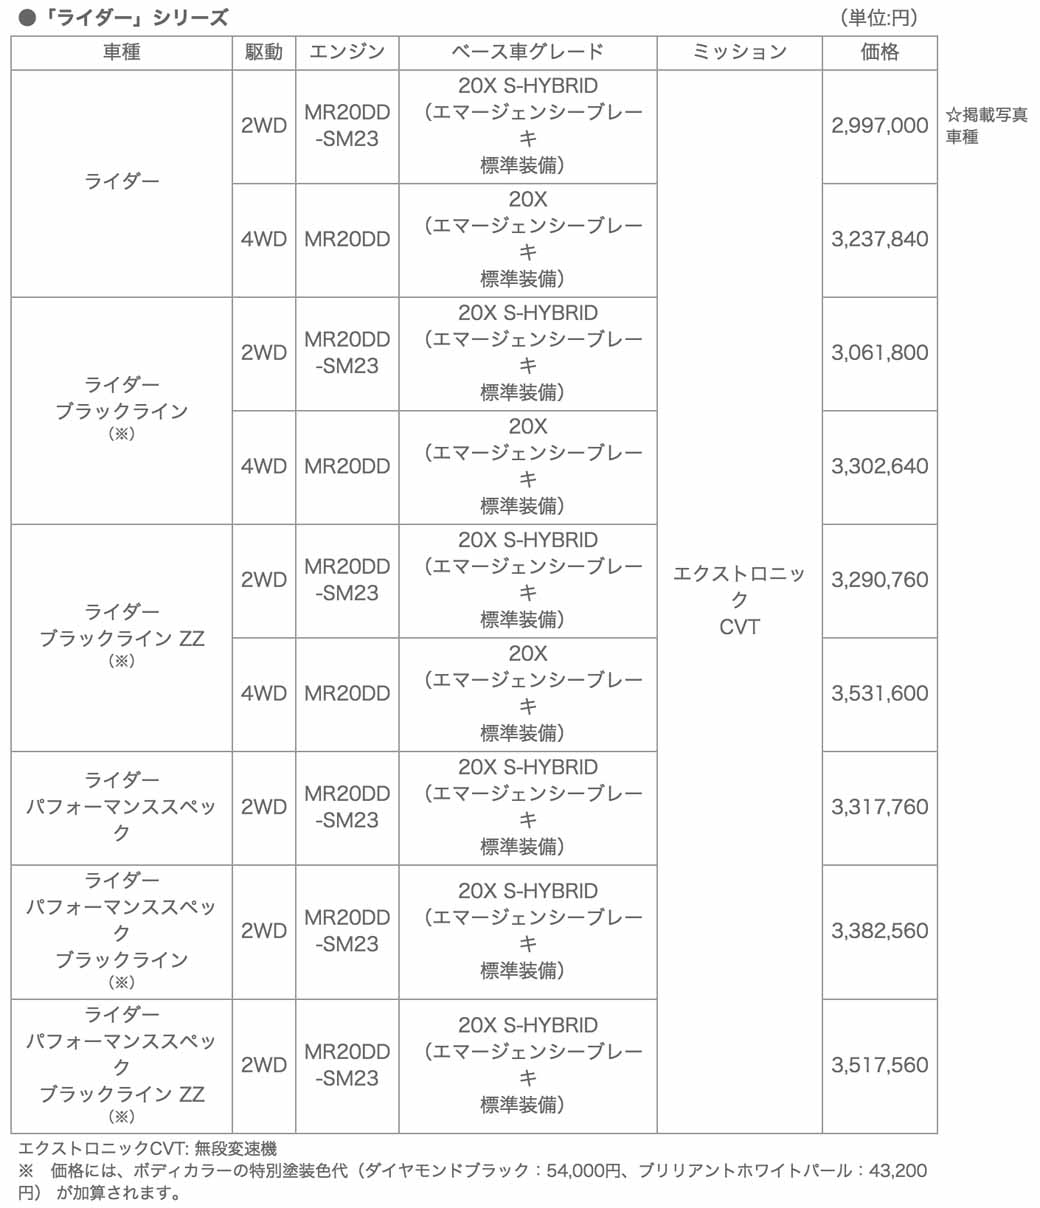 autech-japan-nissan-serena-custom-rider-lv-series-added-new-models20150715-3-min